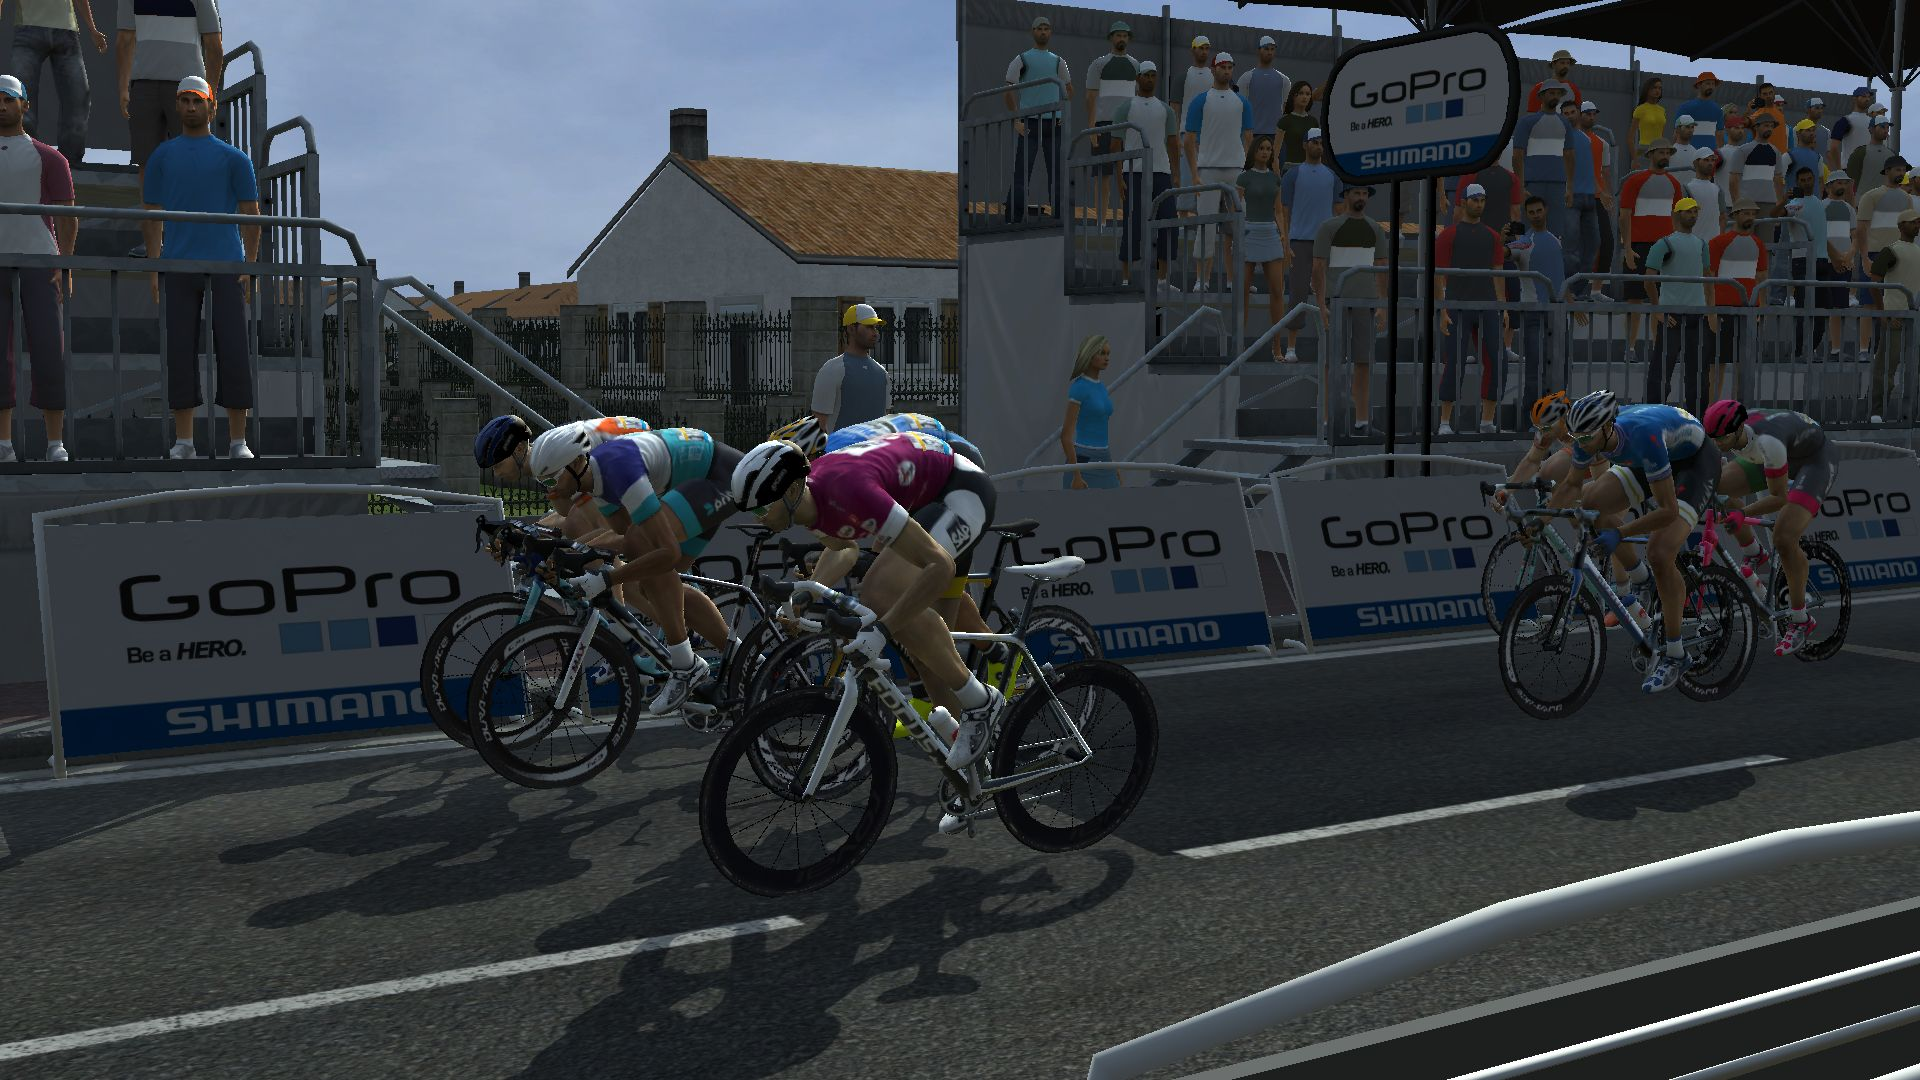 pcmdaily.com/images/mg/2018/Races/GTM/Giro/mg18_giro_07_PCM0104.jpg